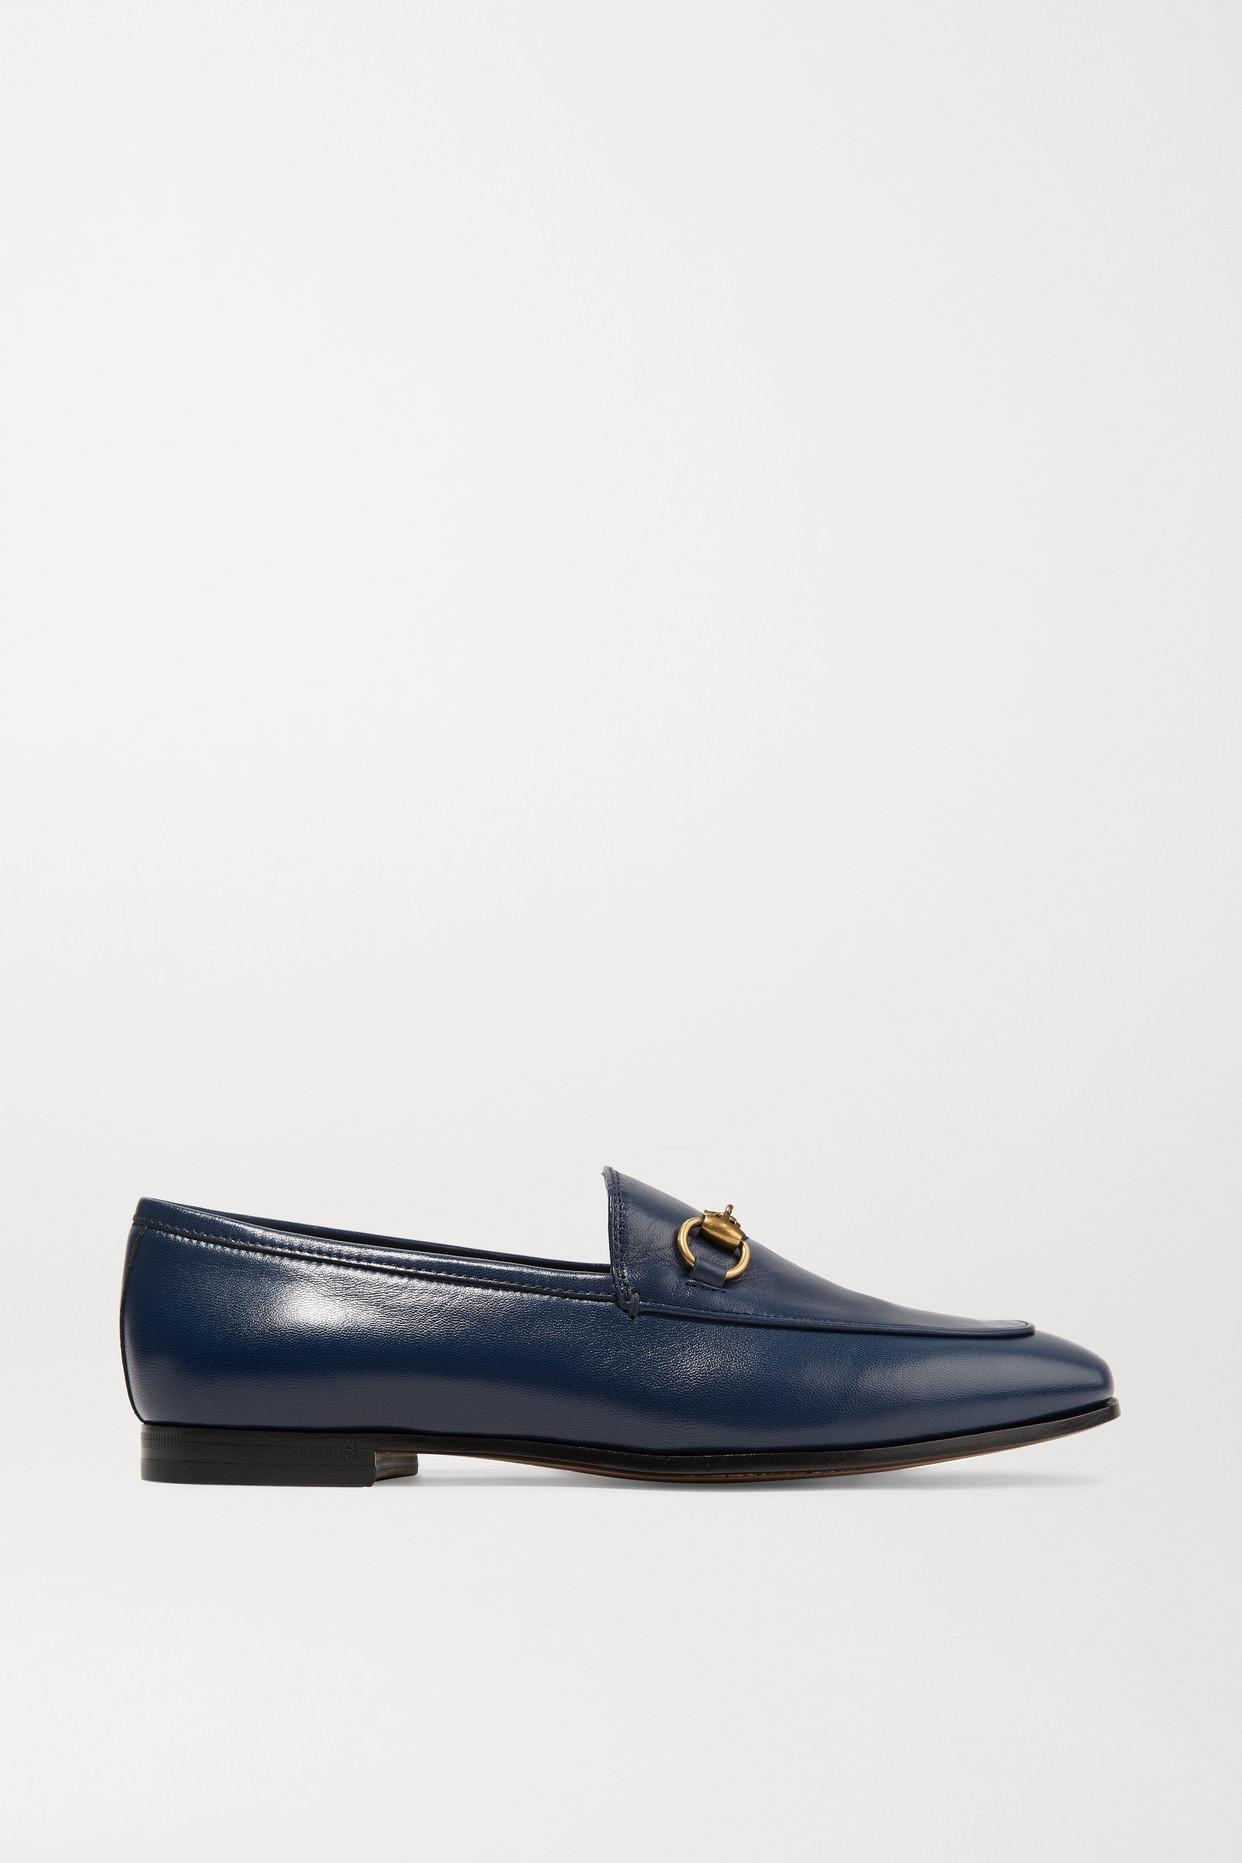 GUCCI - Jordaan Horsebit-detailed Leather Loafers - Blue - IT42